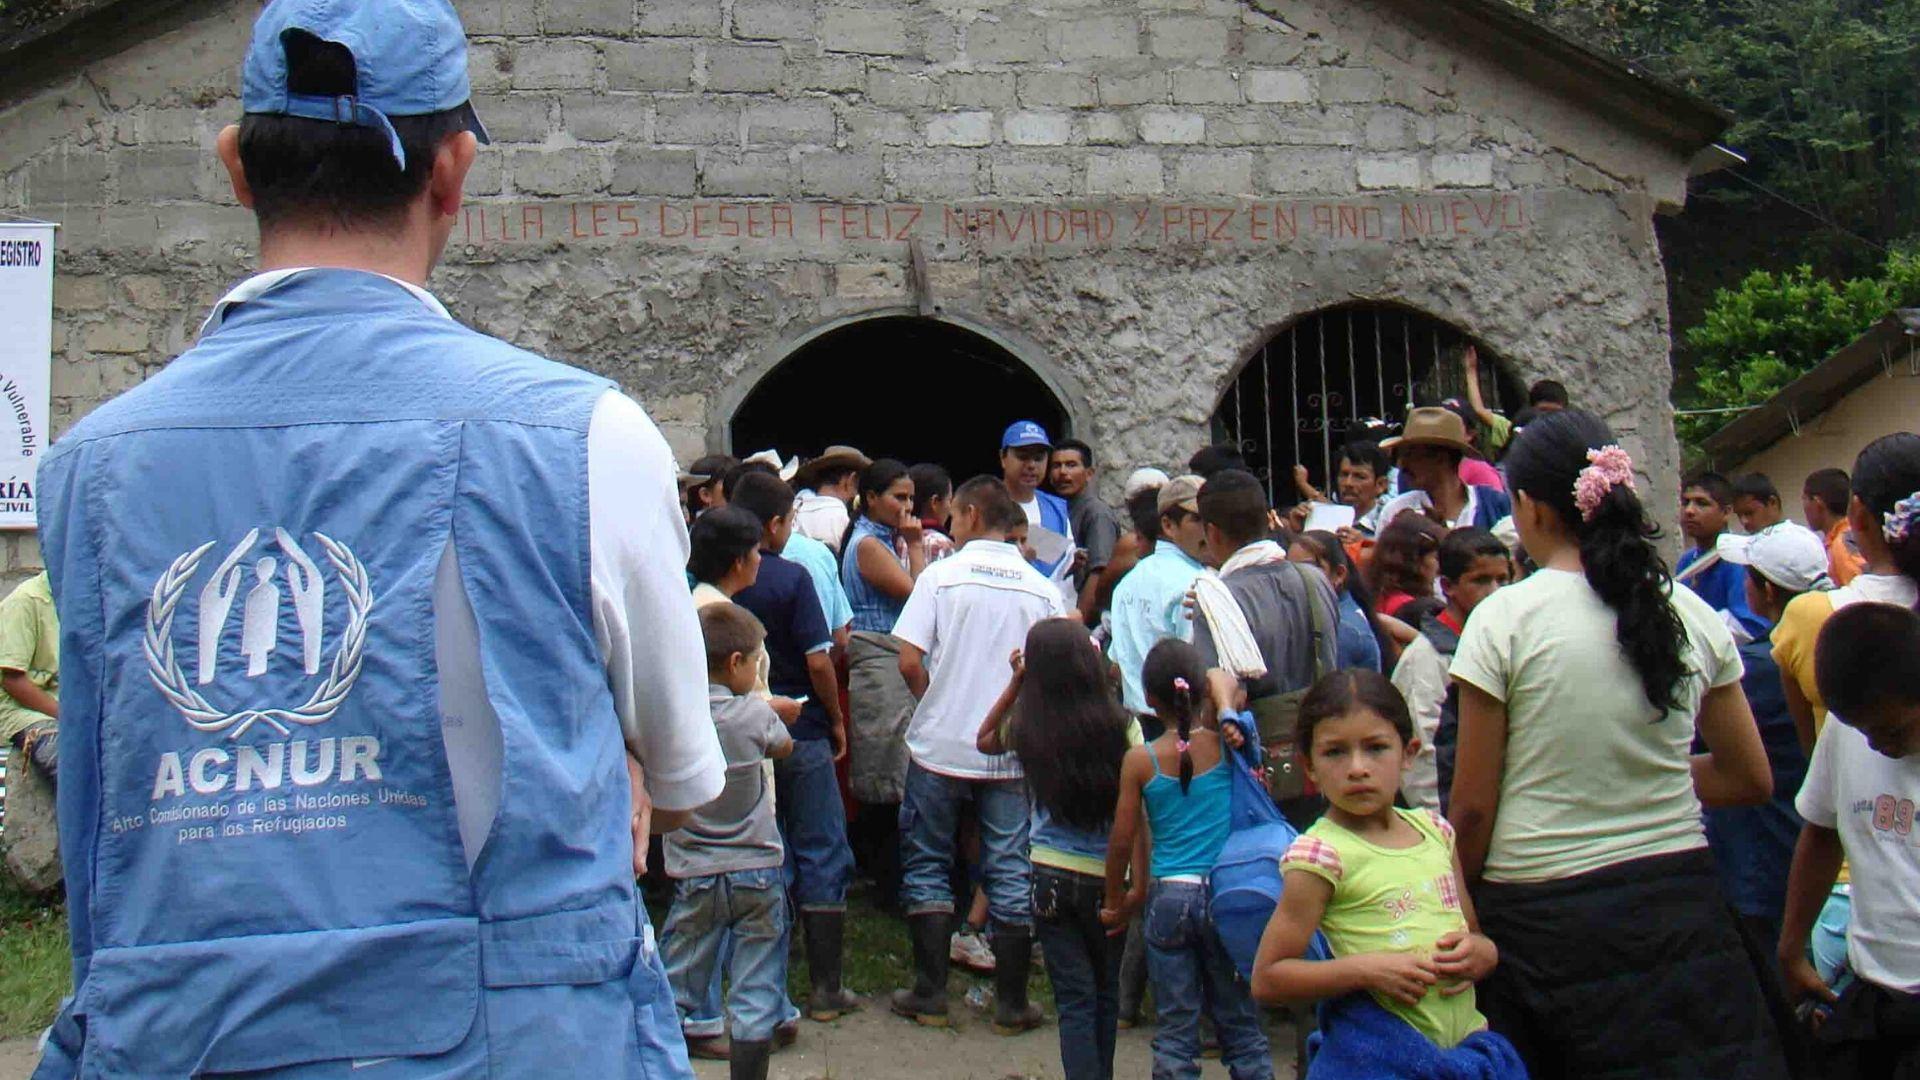 Acnur solicita aumentar ayuda para refugiados venezolanos